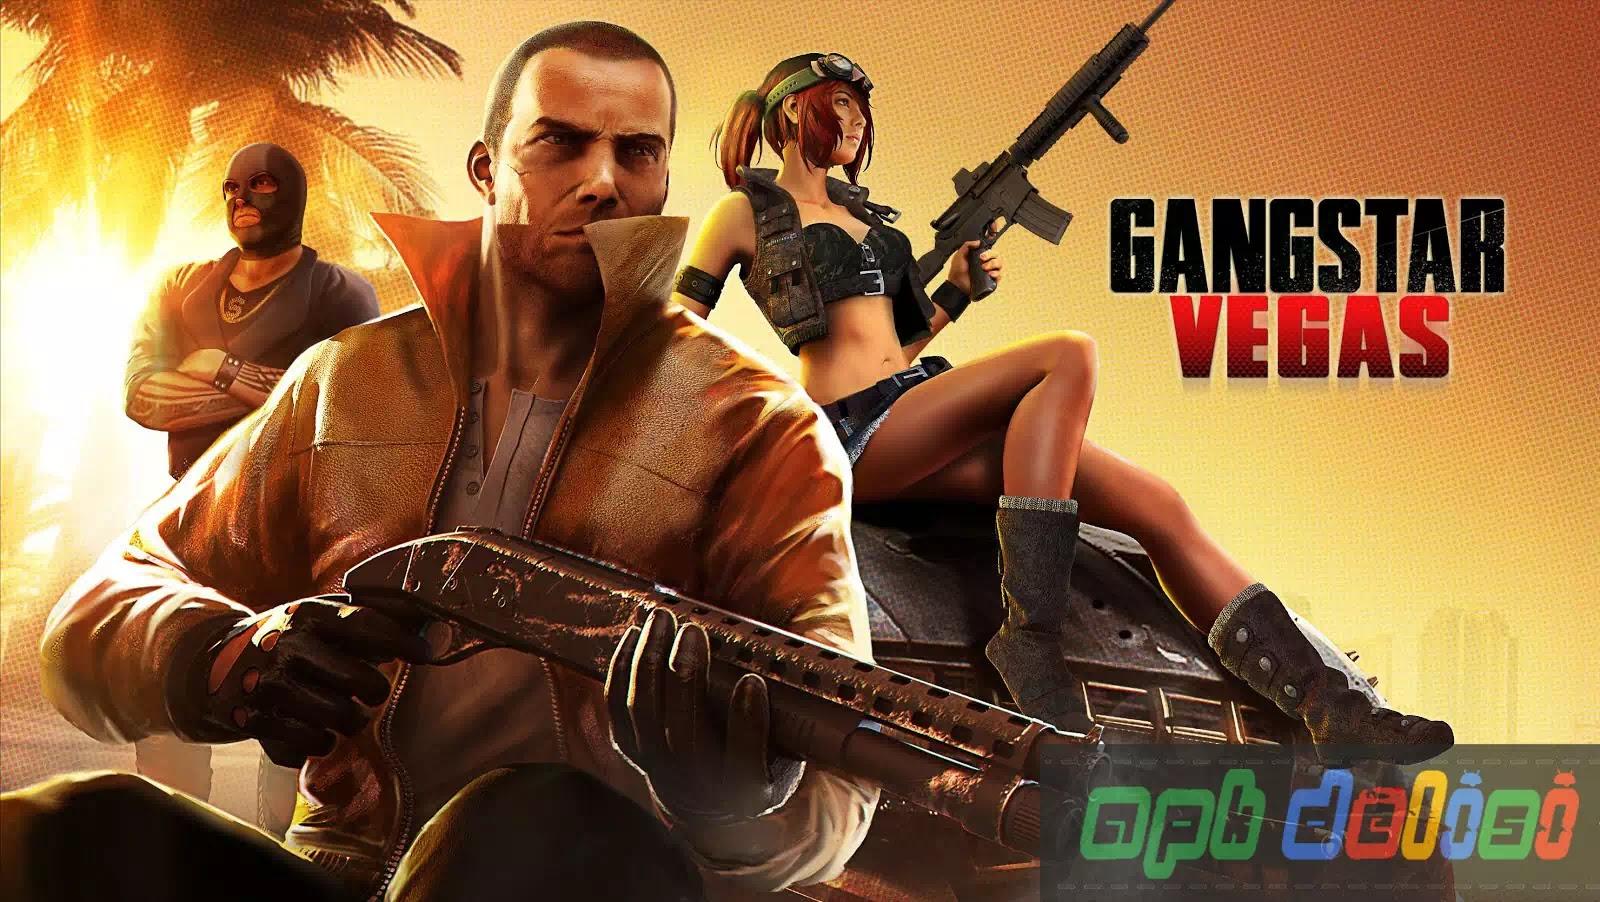 Vegas Gangsteri v4.5.0i MEGA MOD APK — MEGA HİLELİ